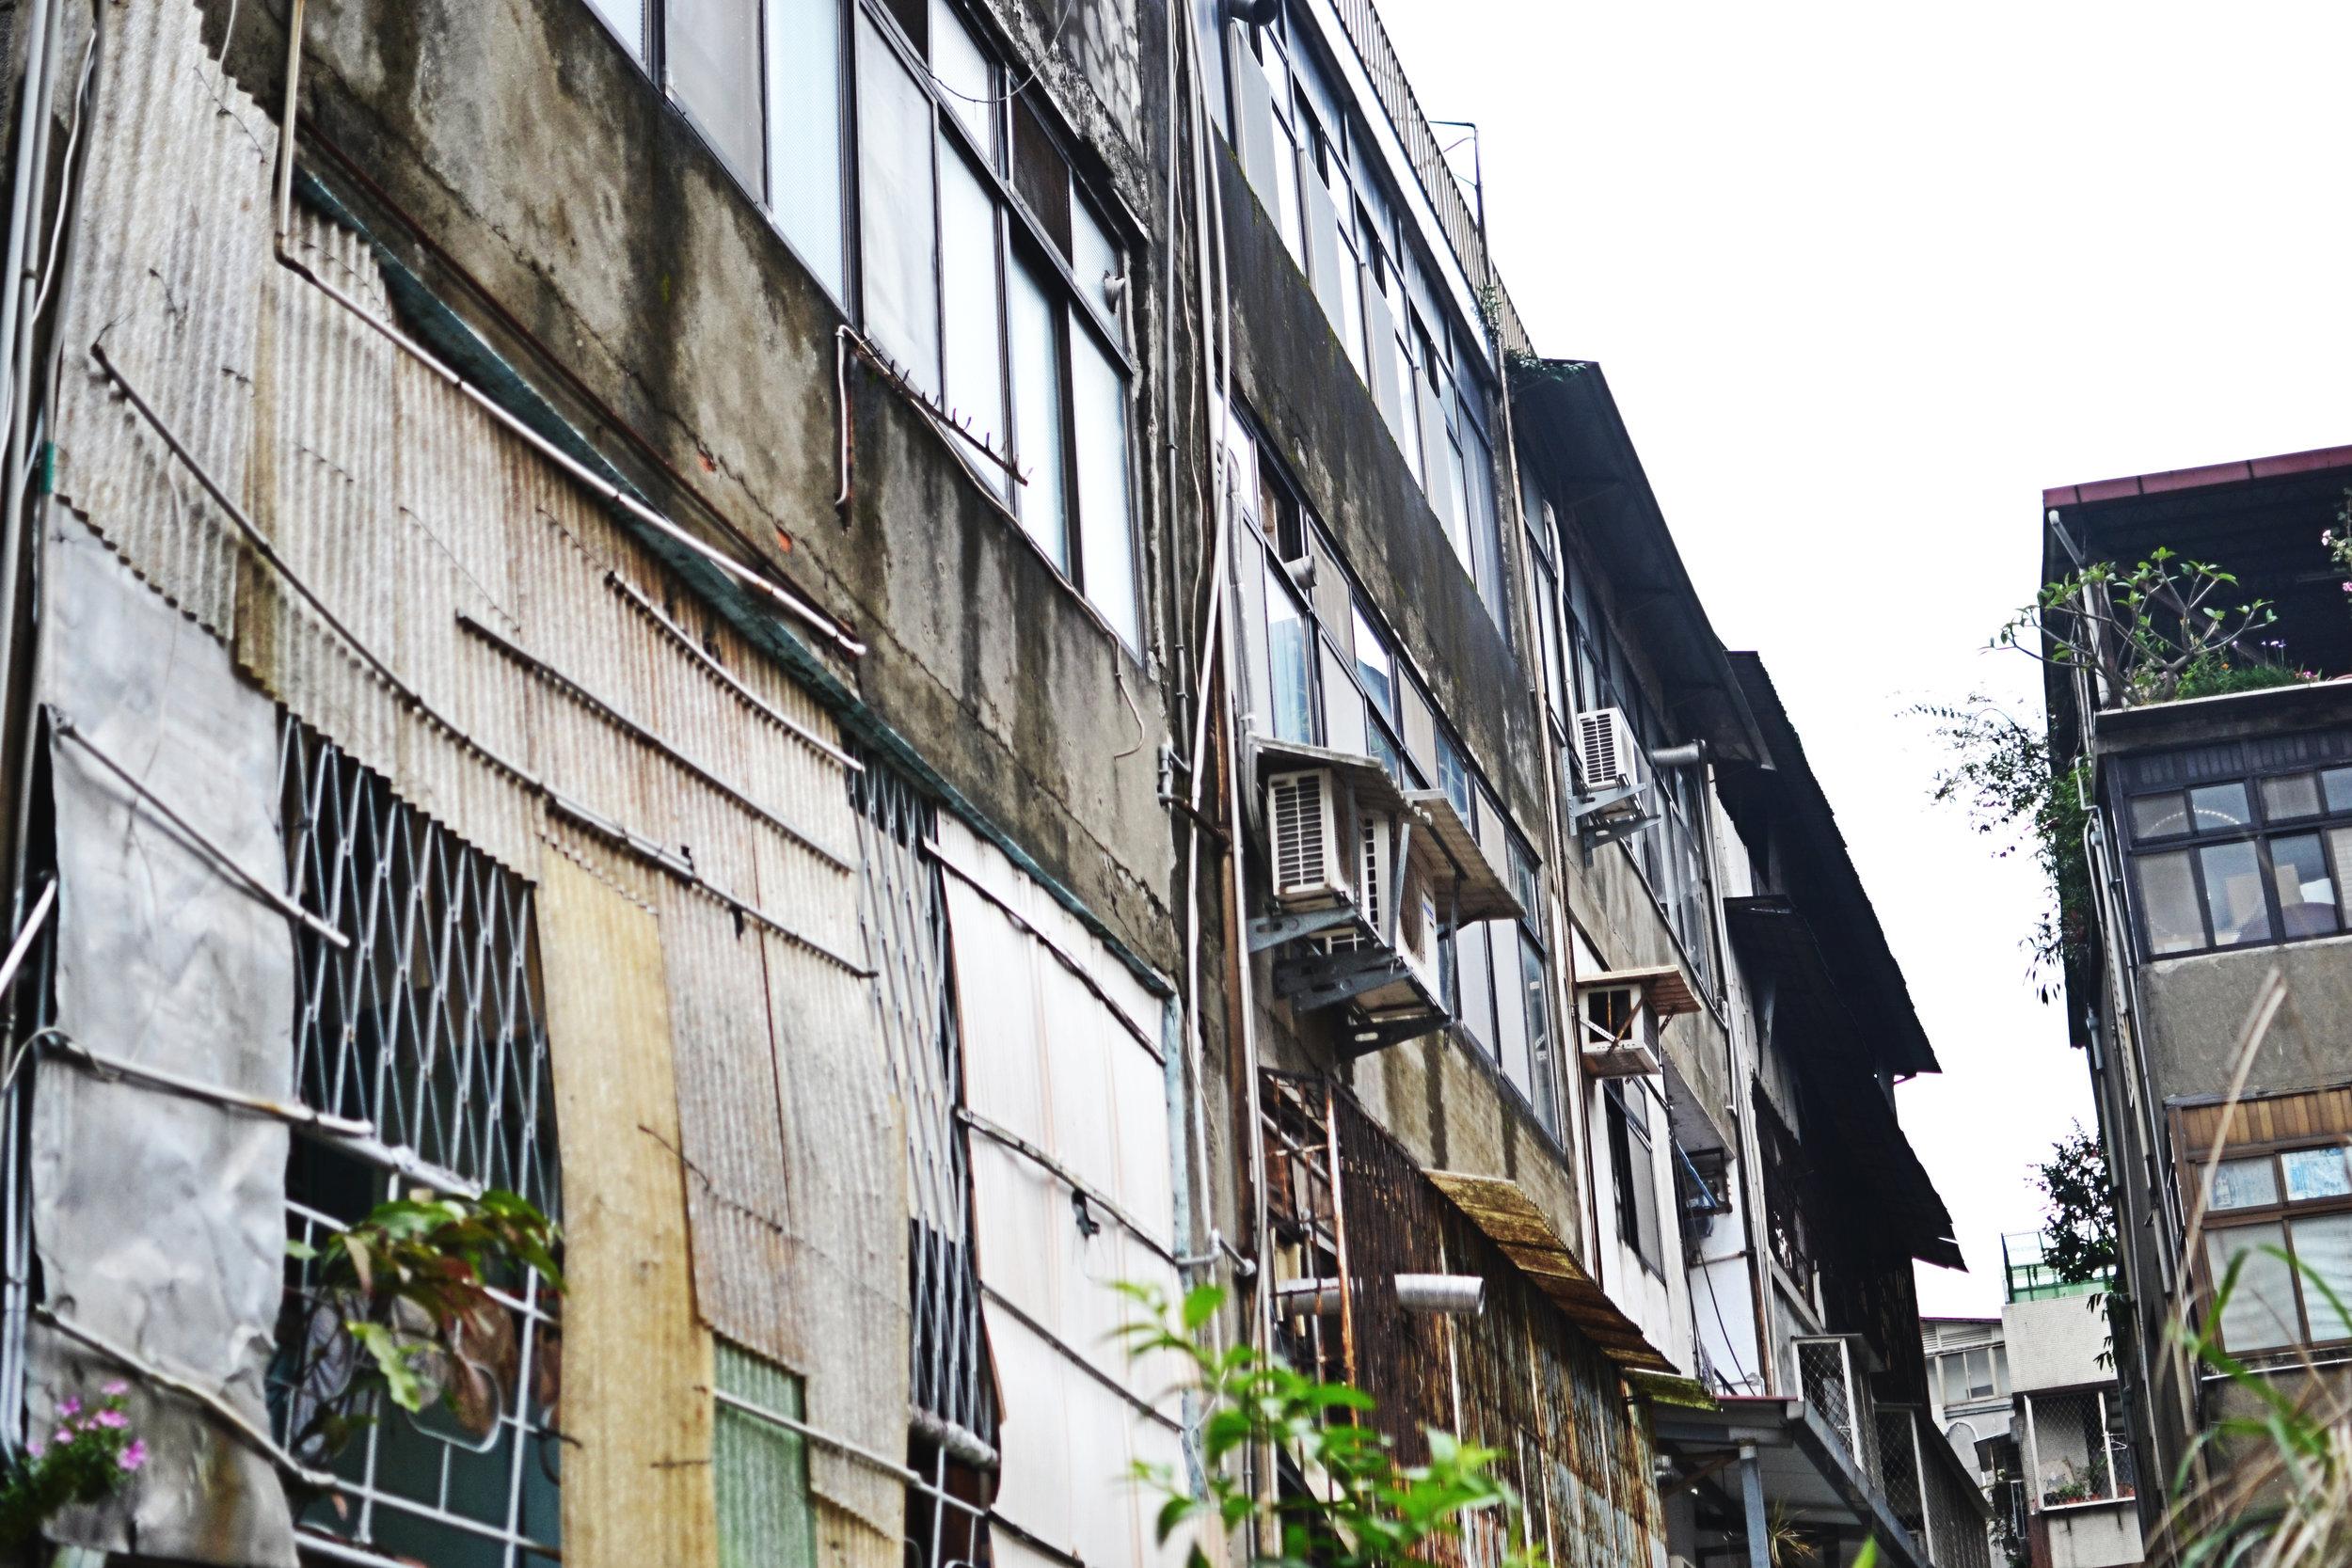 Sheet metal walls of apartments in Taipei, Taiwan